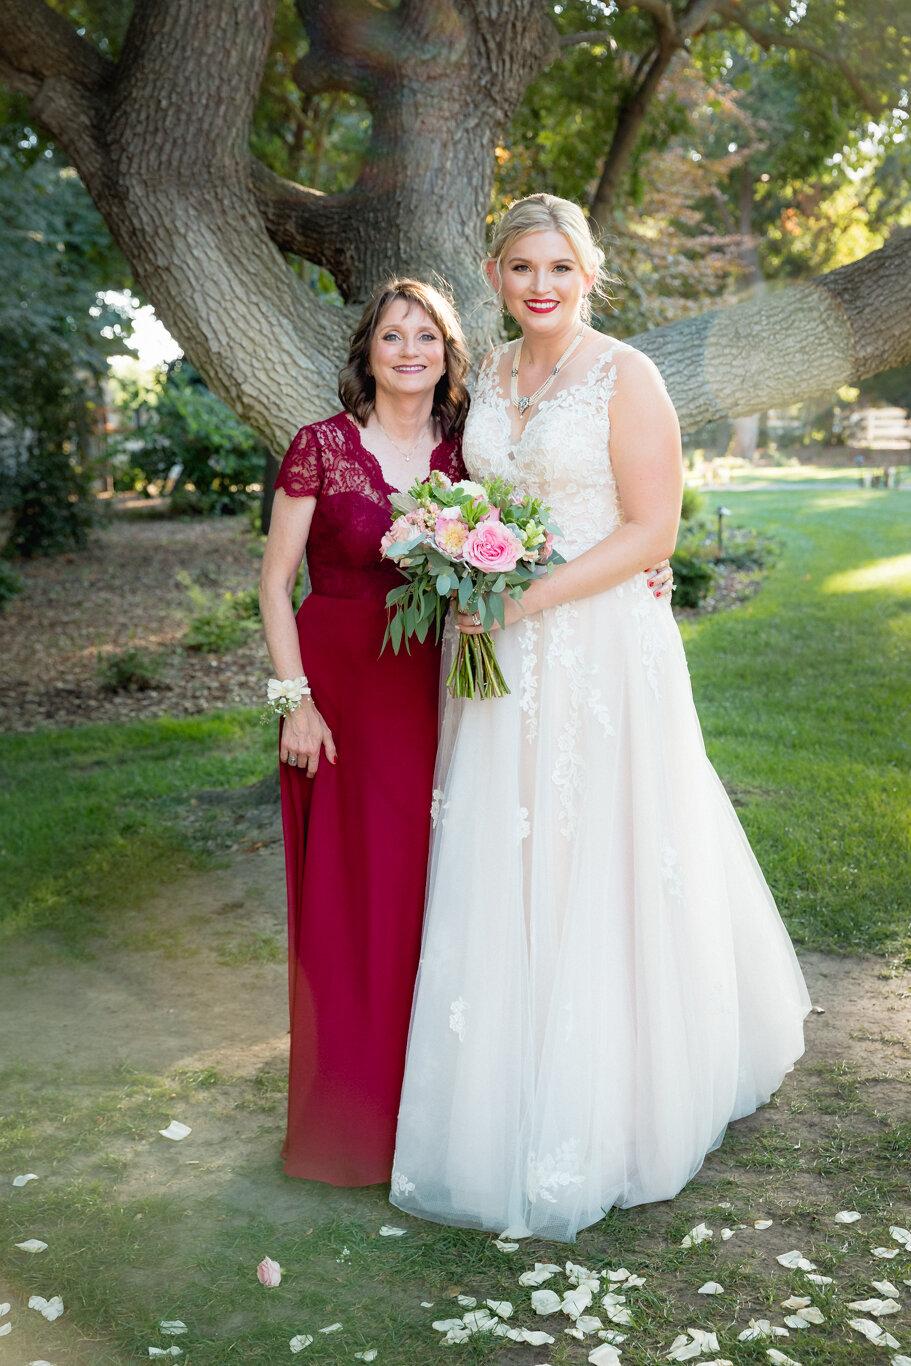 2019.08.24_Emily-Ashir-Wedding-at-the-Maples-6050.jpg